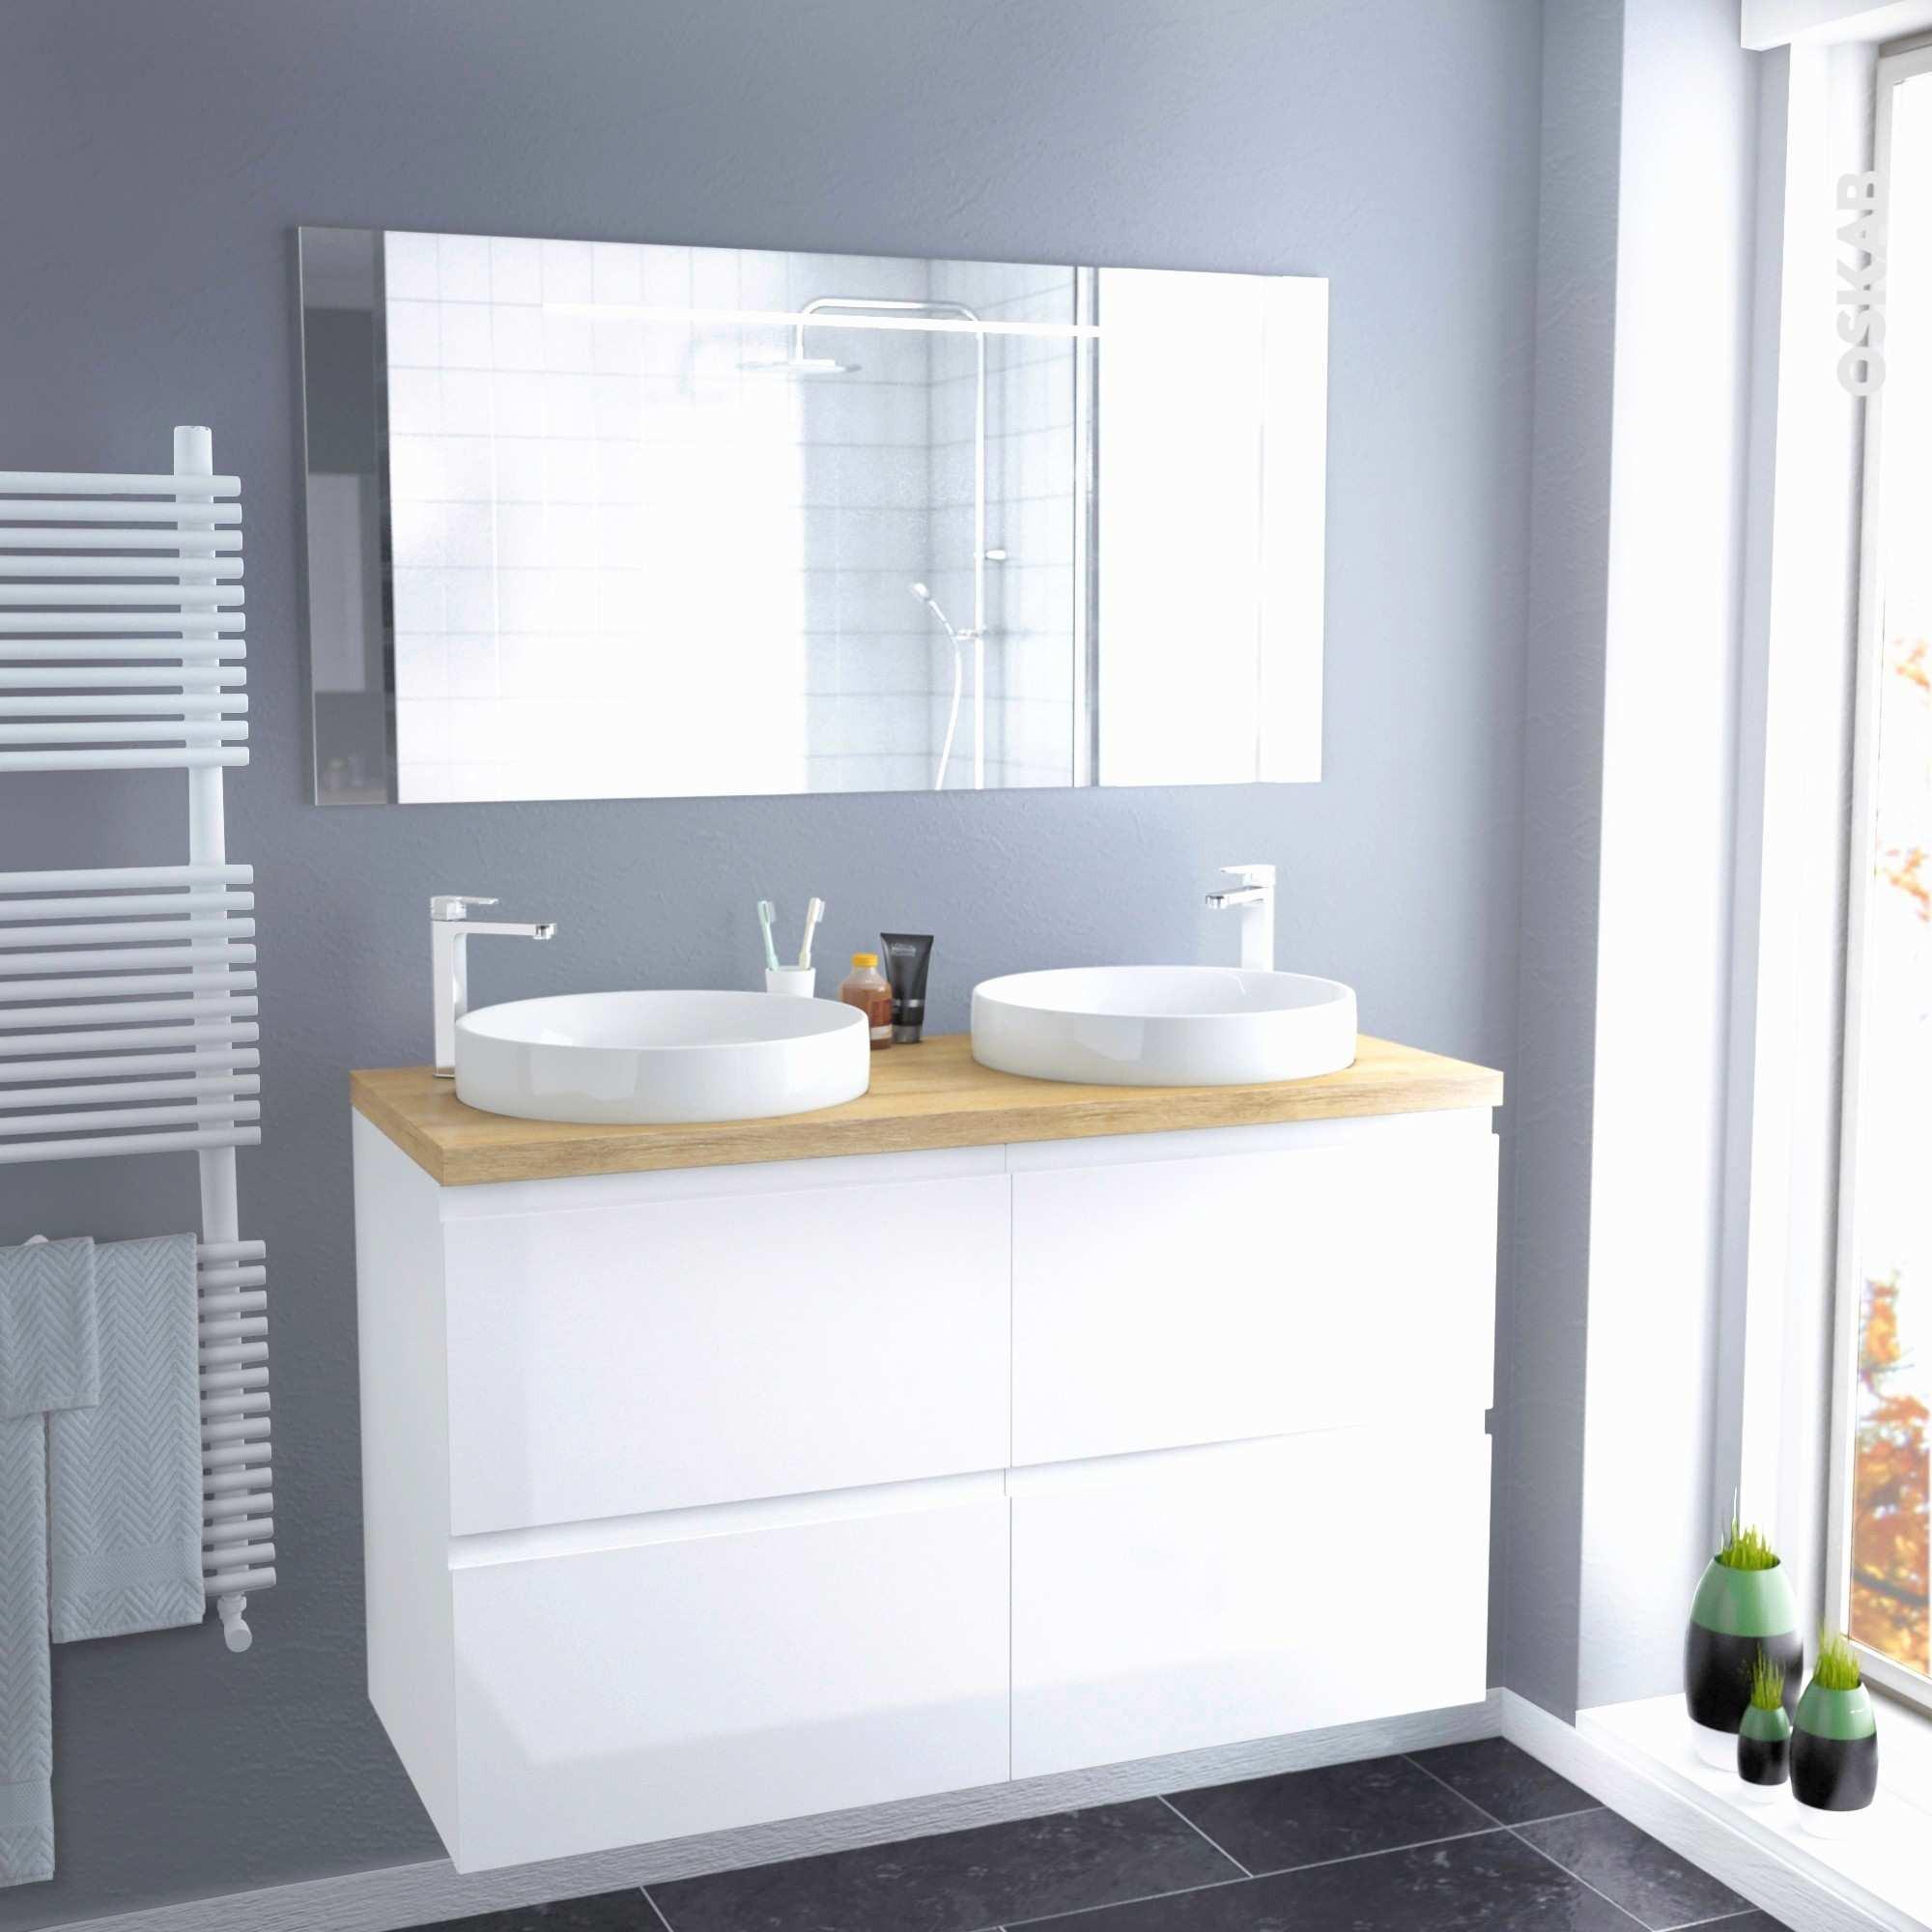 meuble de salle de bain bois salle de bain moderne noir et blanc gallery carrelage roger 0d of meuble de salle de bain bois